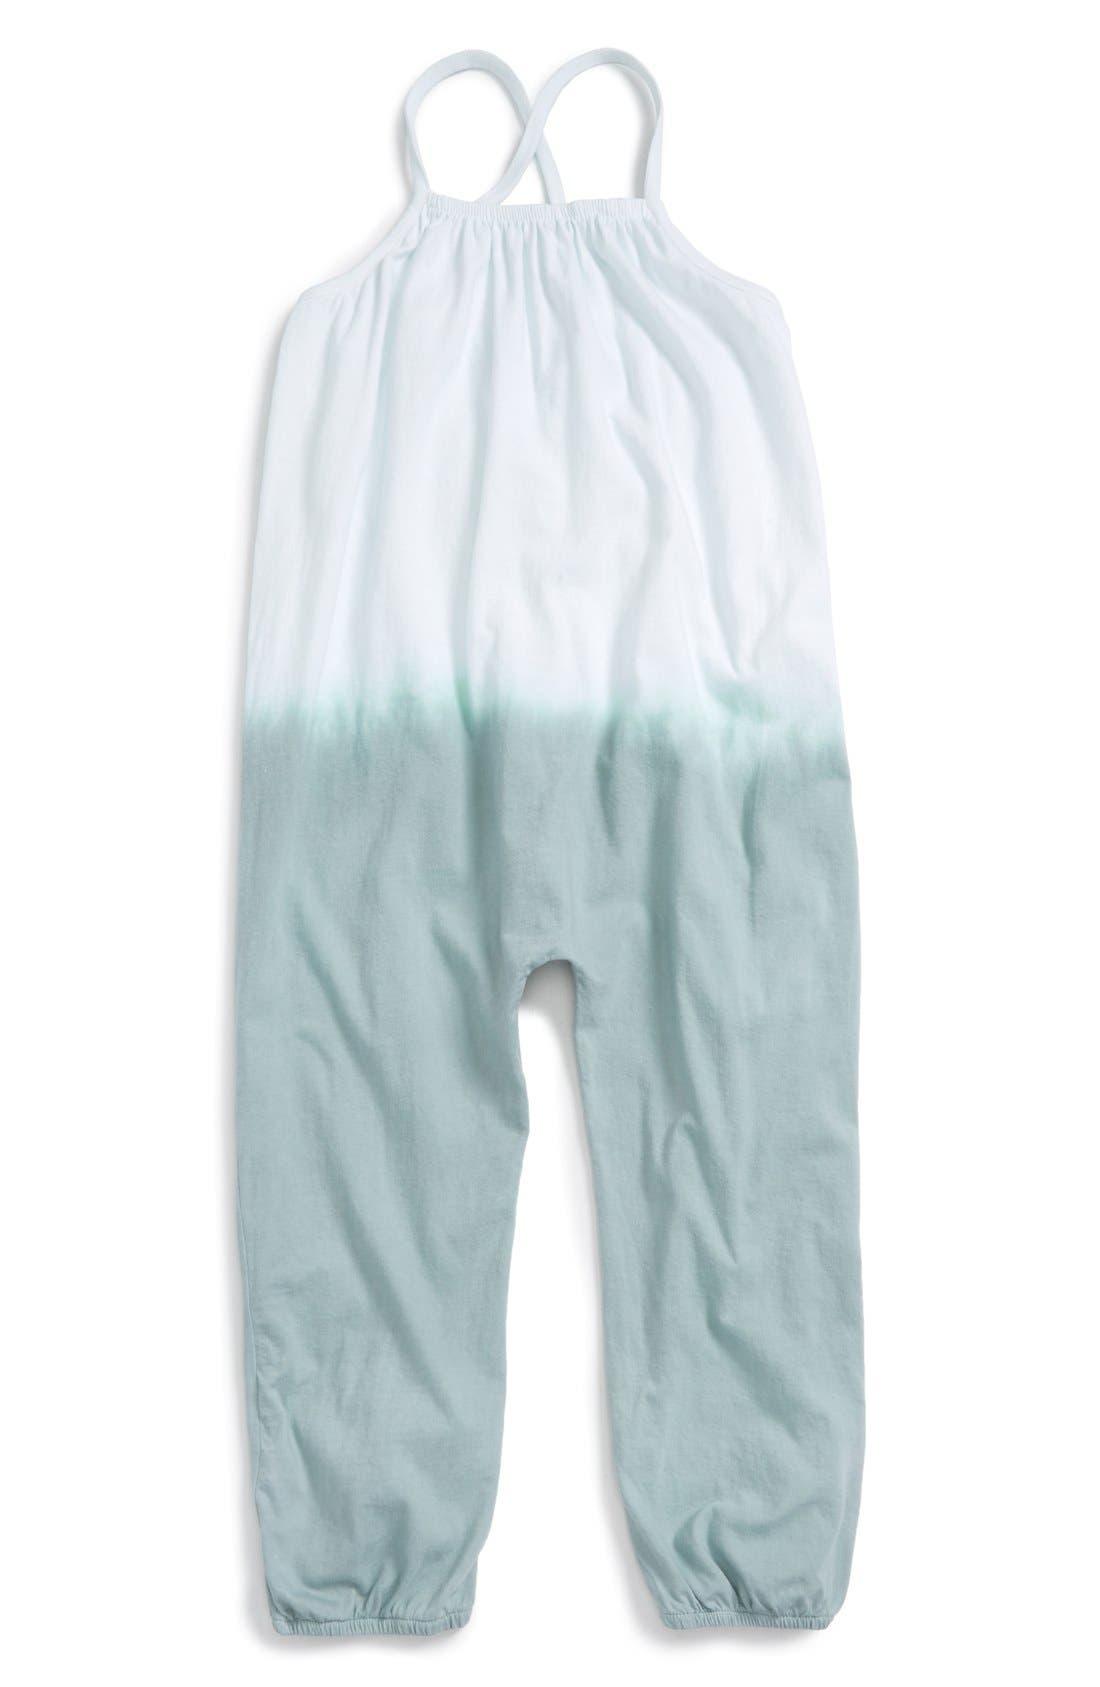 Main Image - Burt's Bees Baby Dip Dye Sleeveless Jumpsuit (Toddler Girls & Little Girls)